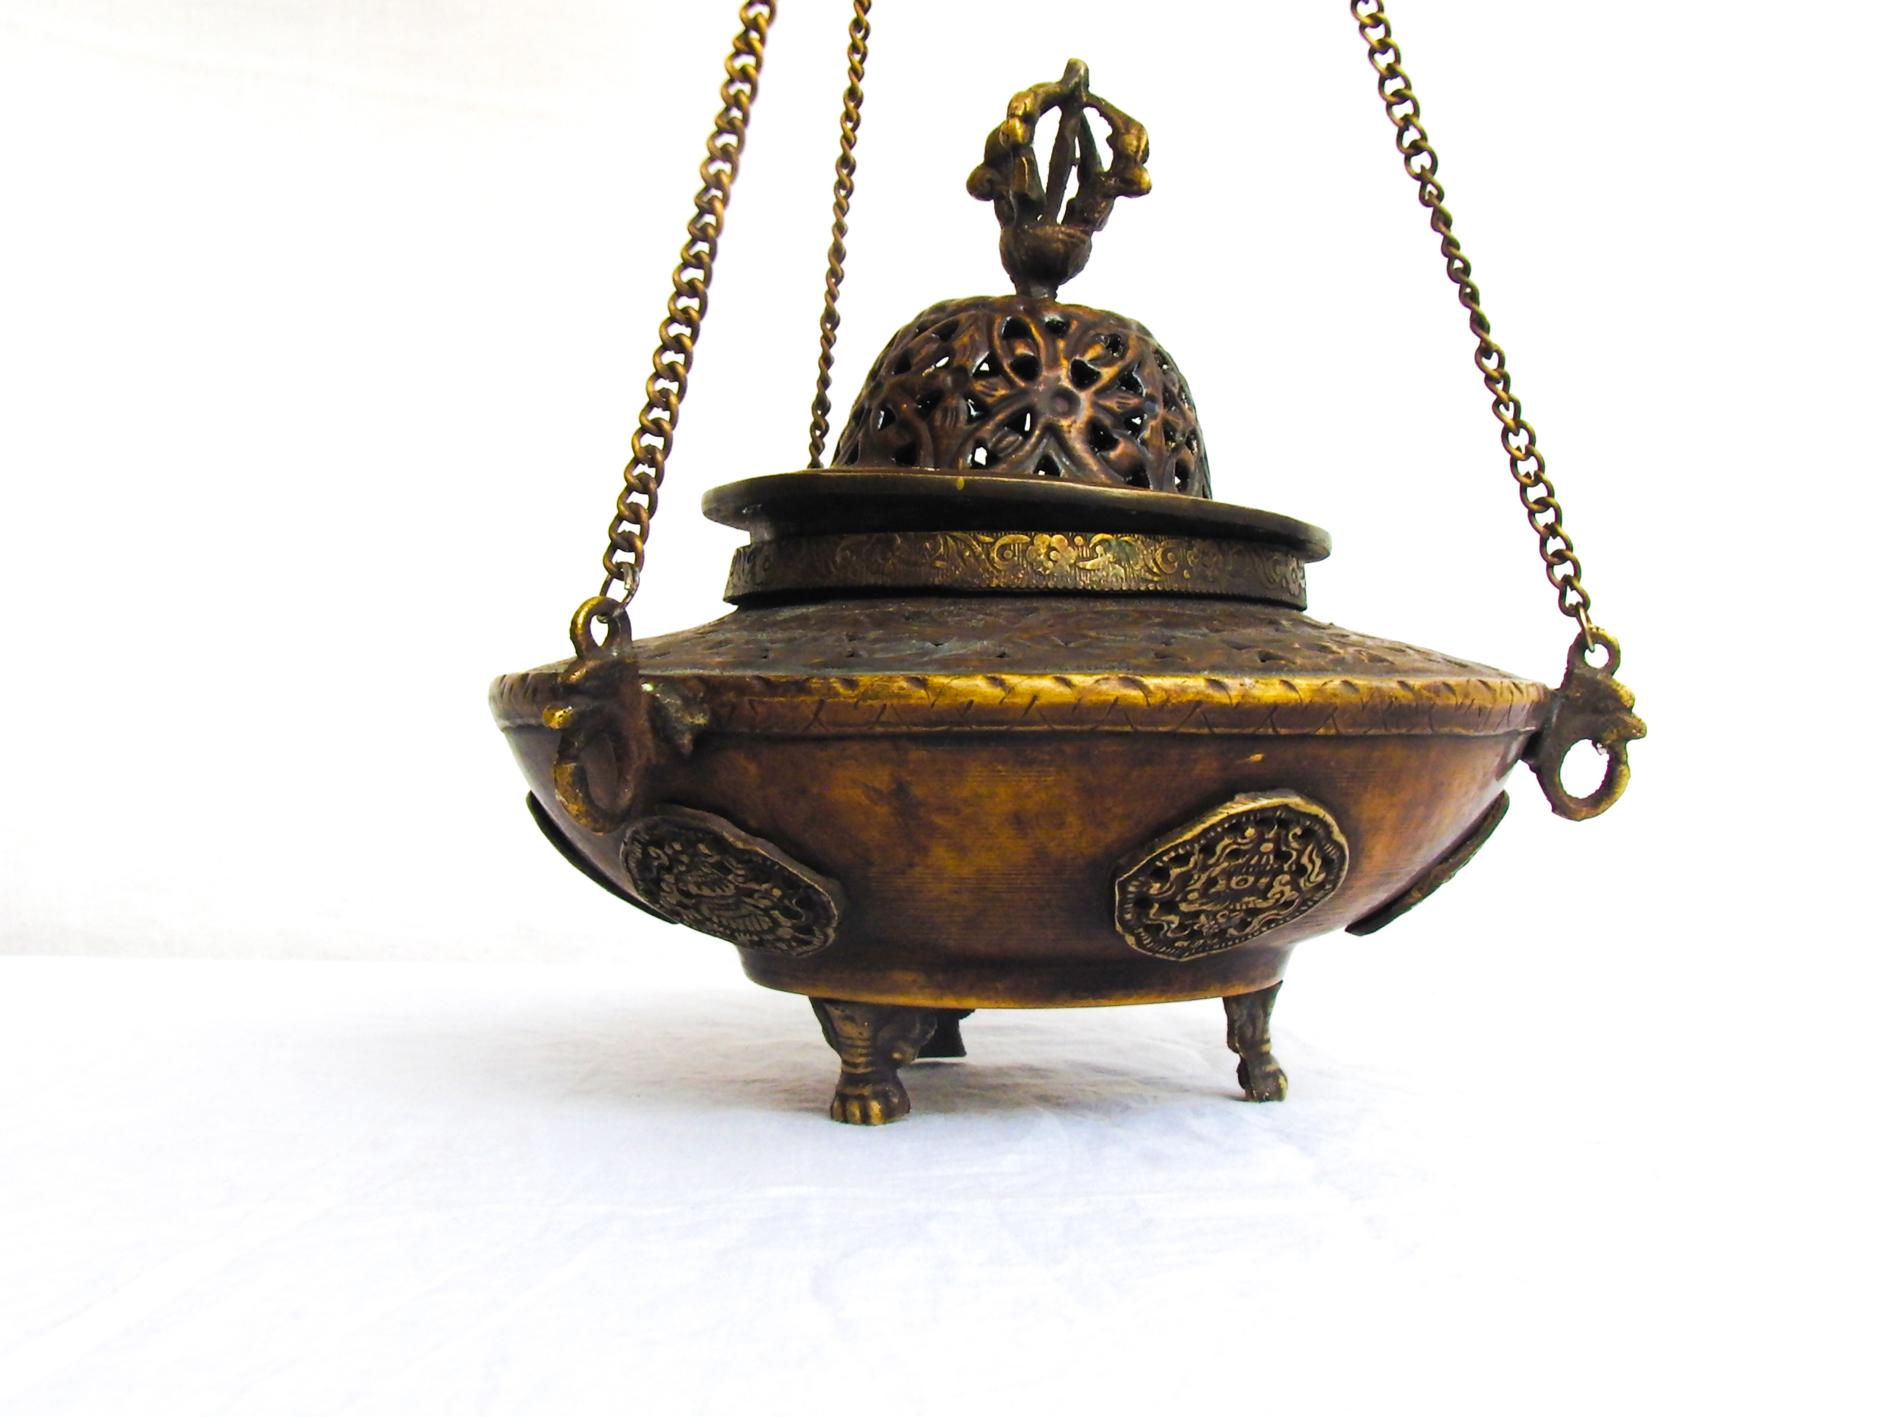 photo for round bronze